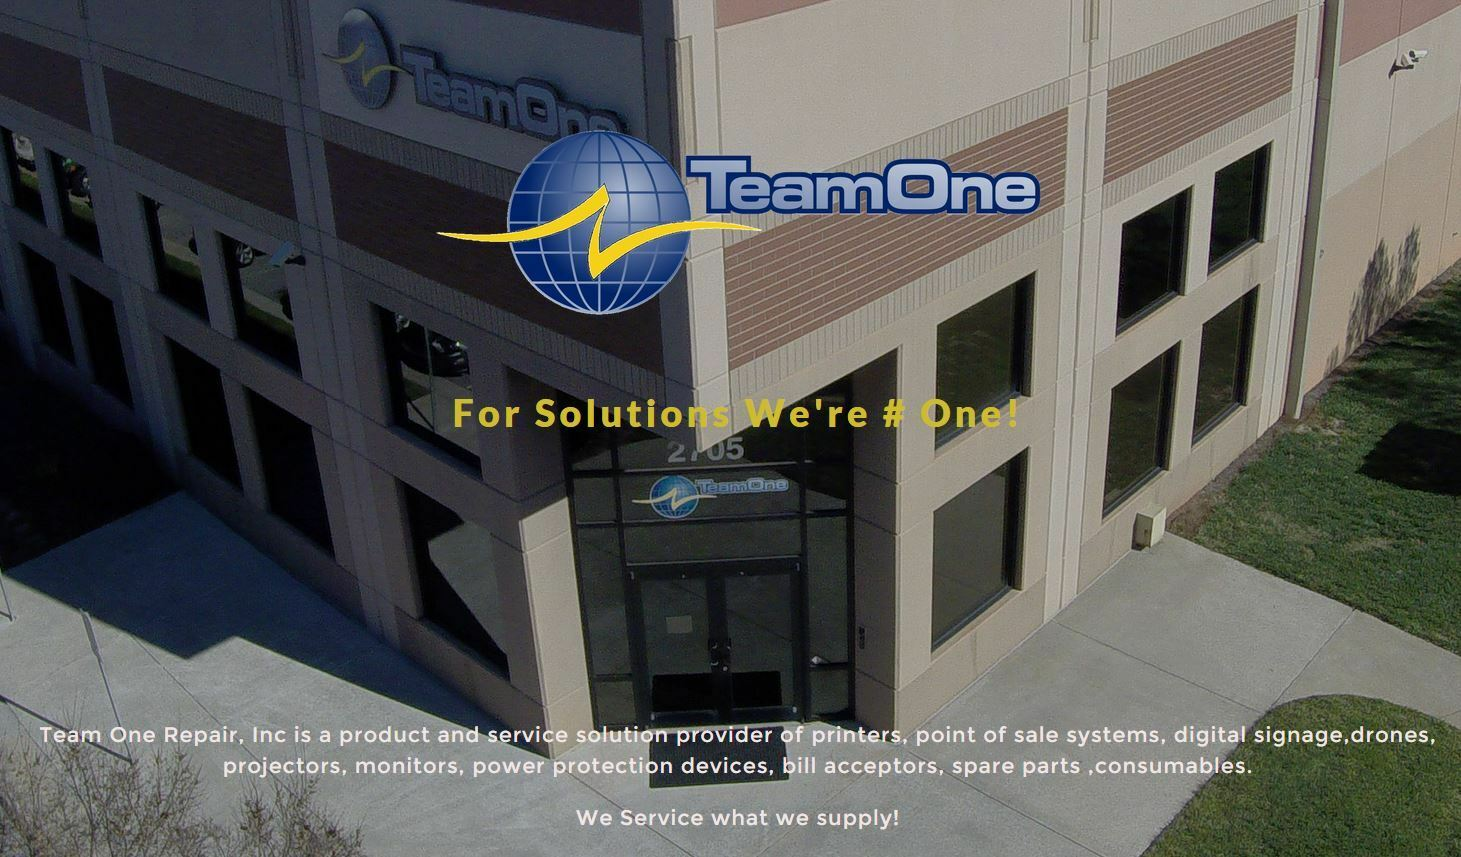 Team One Repair